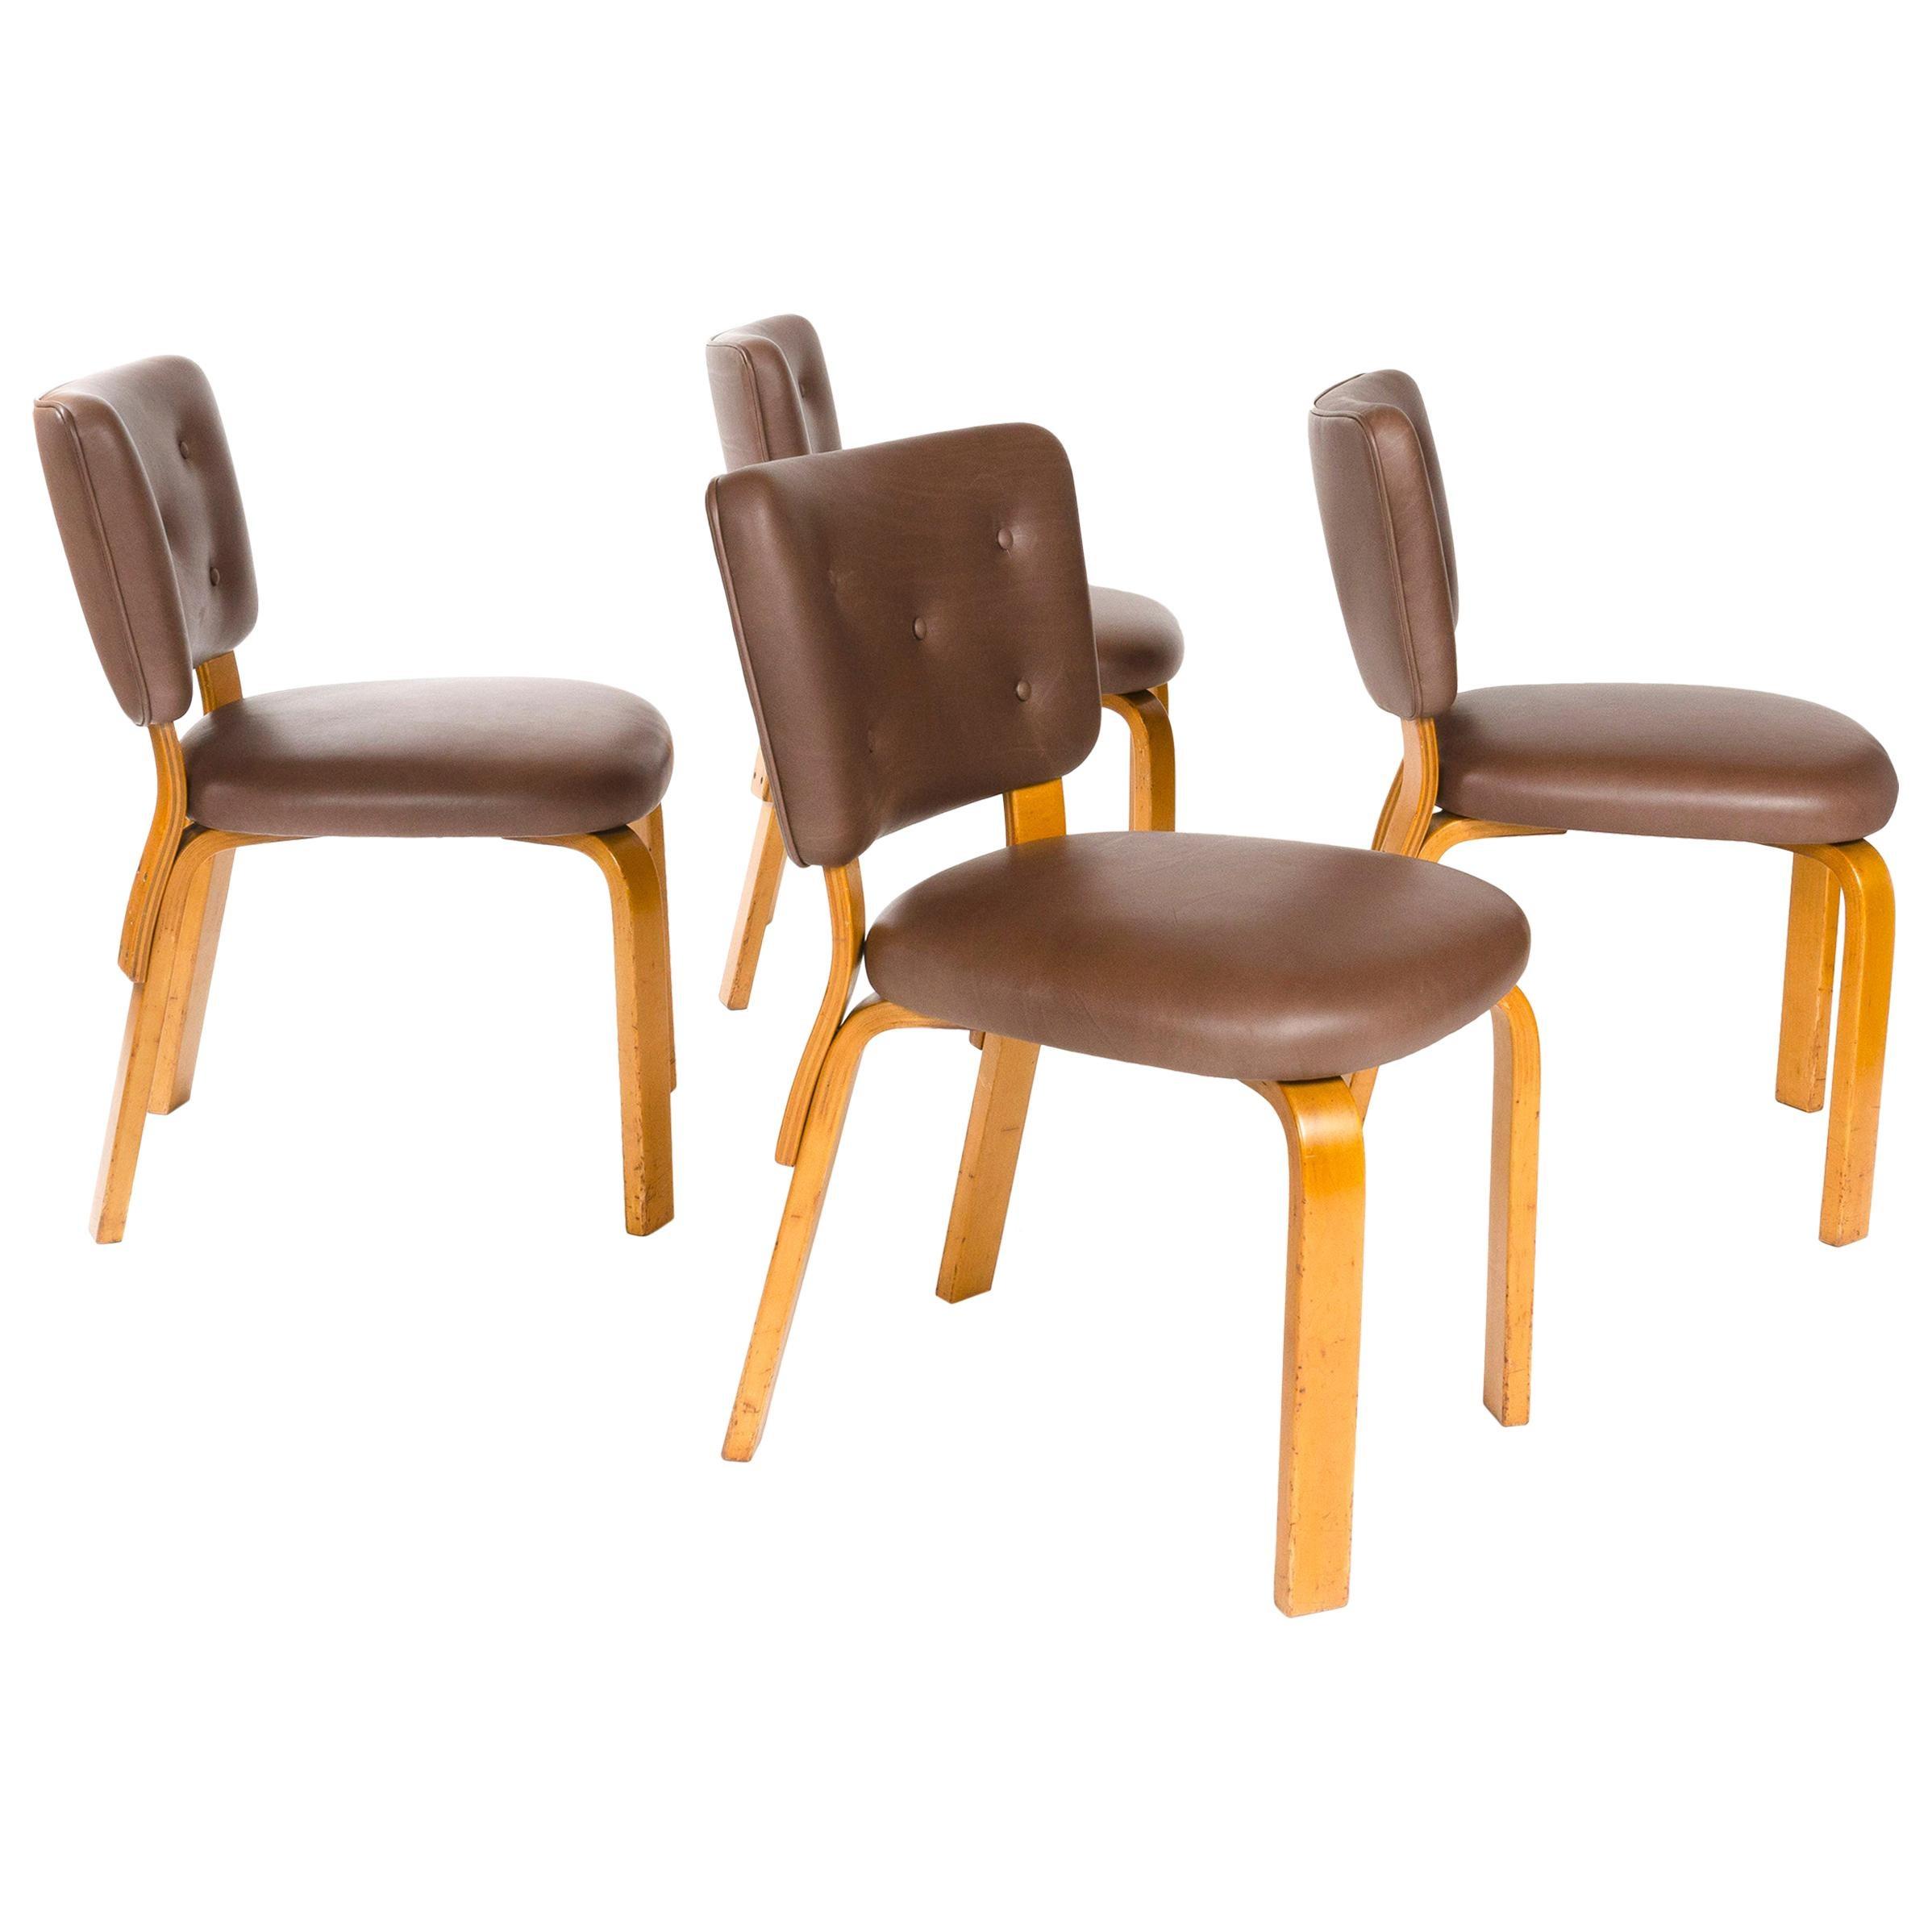 1940s Finnish Set of Four Upholstered Dining Chairs by Alvar Aalto for Artek